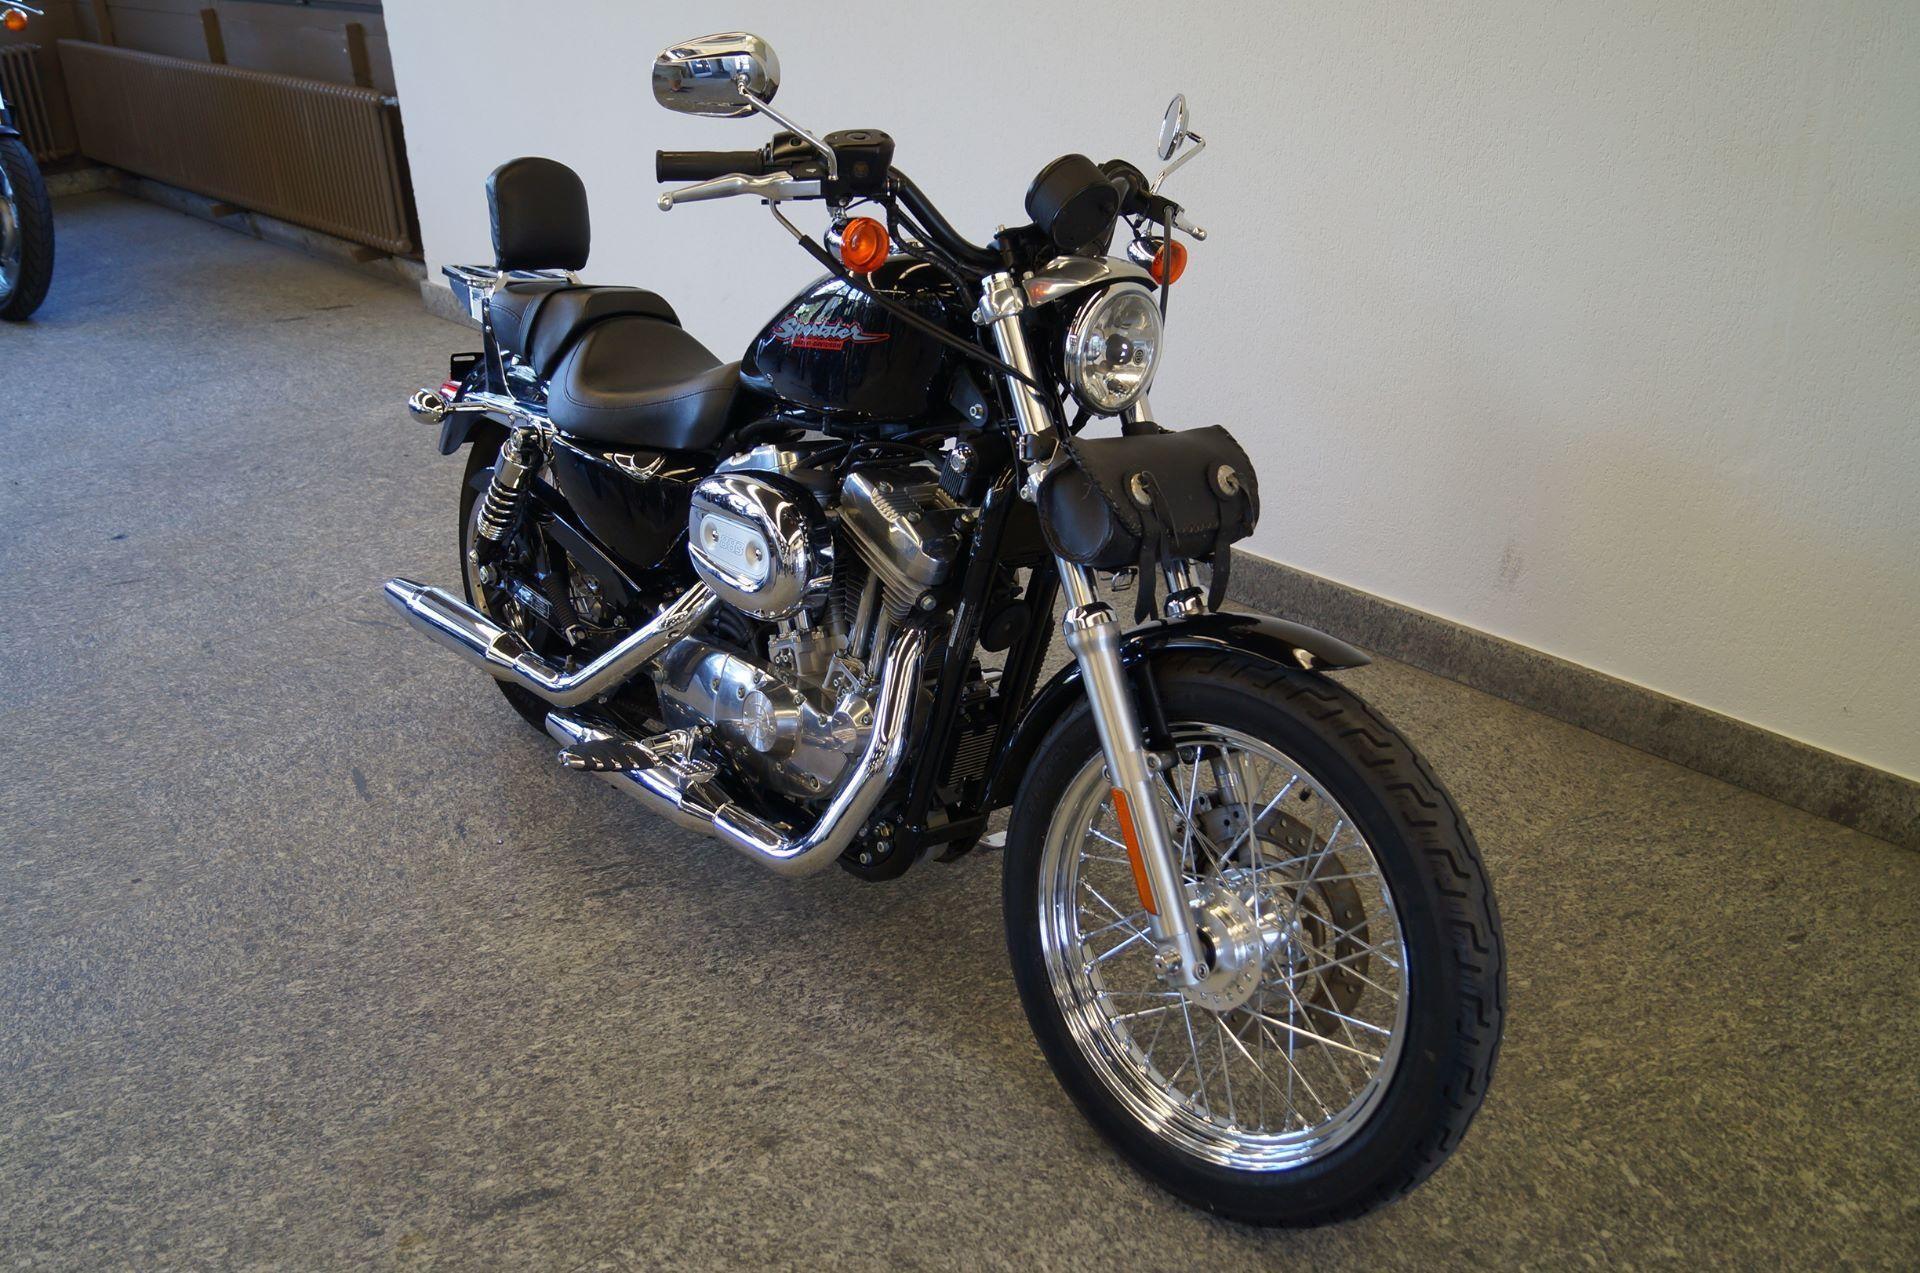 motorrad occasion kaufen harley davidson xlh 883 sportster scherrer motos ag steckborn. Black Bedroom Furniture Sets. Home Design Ideas